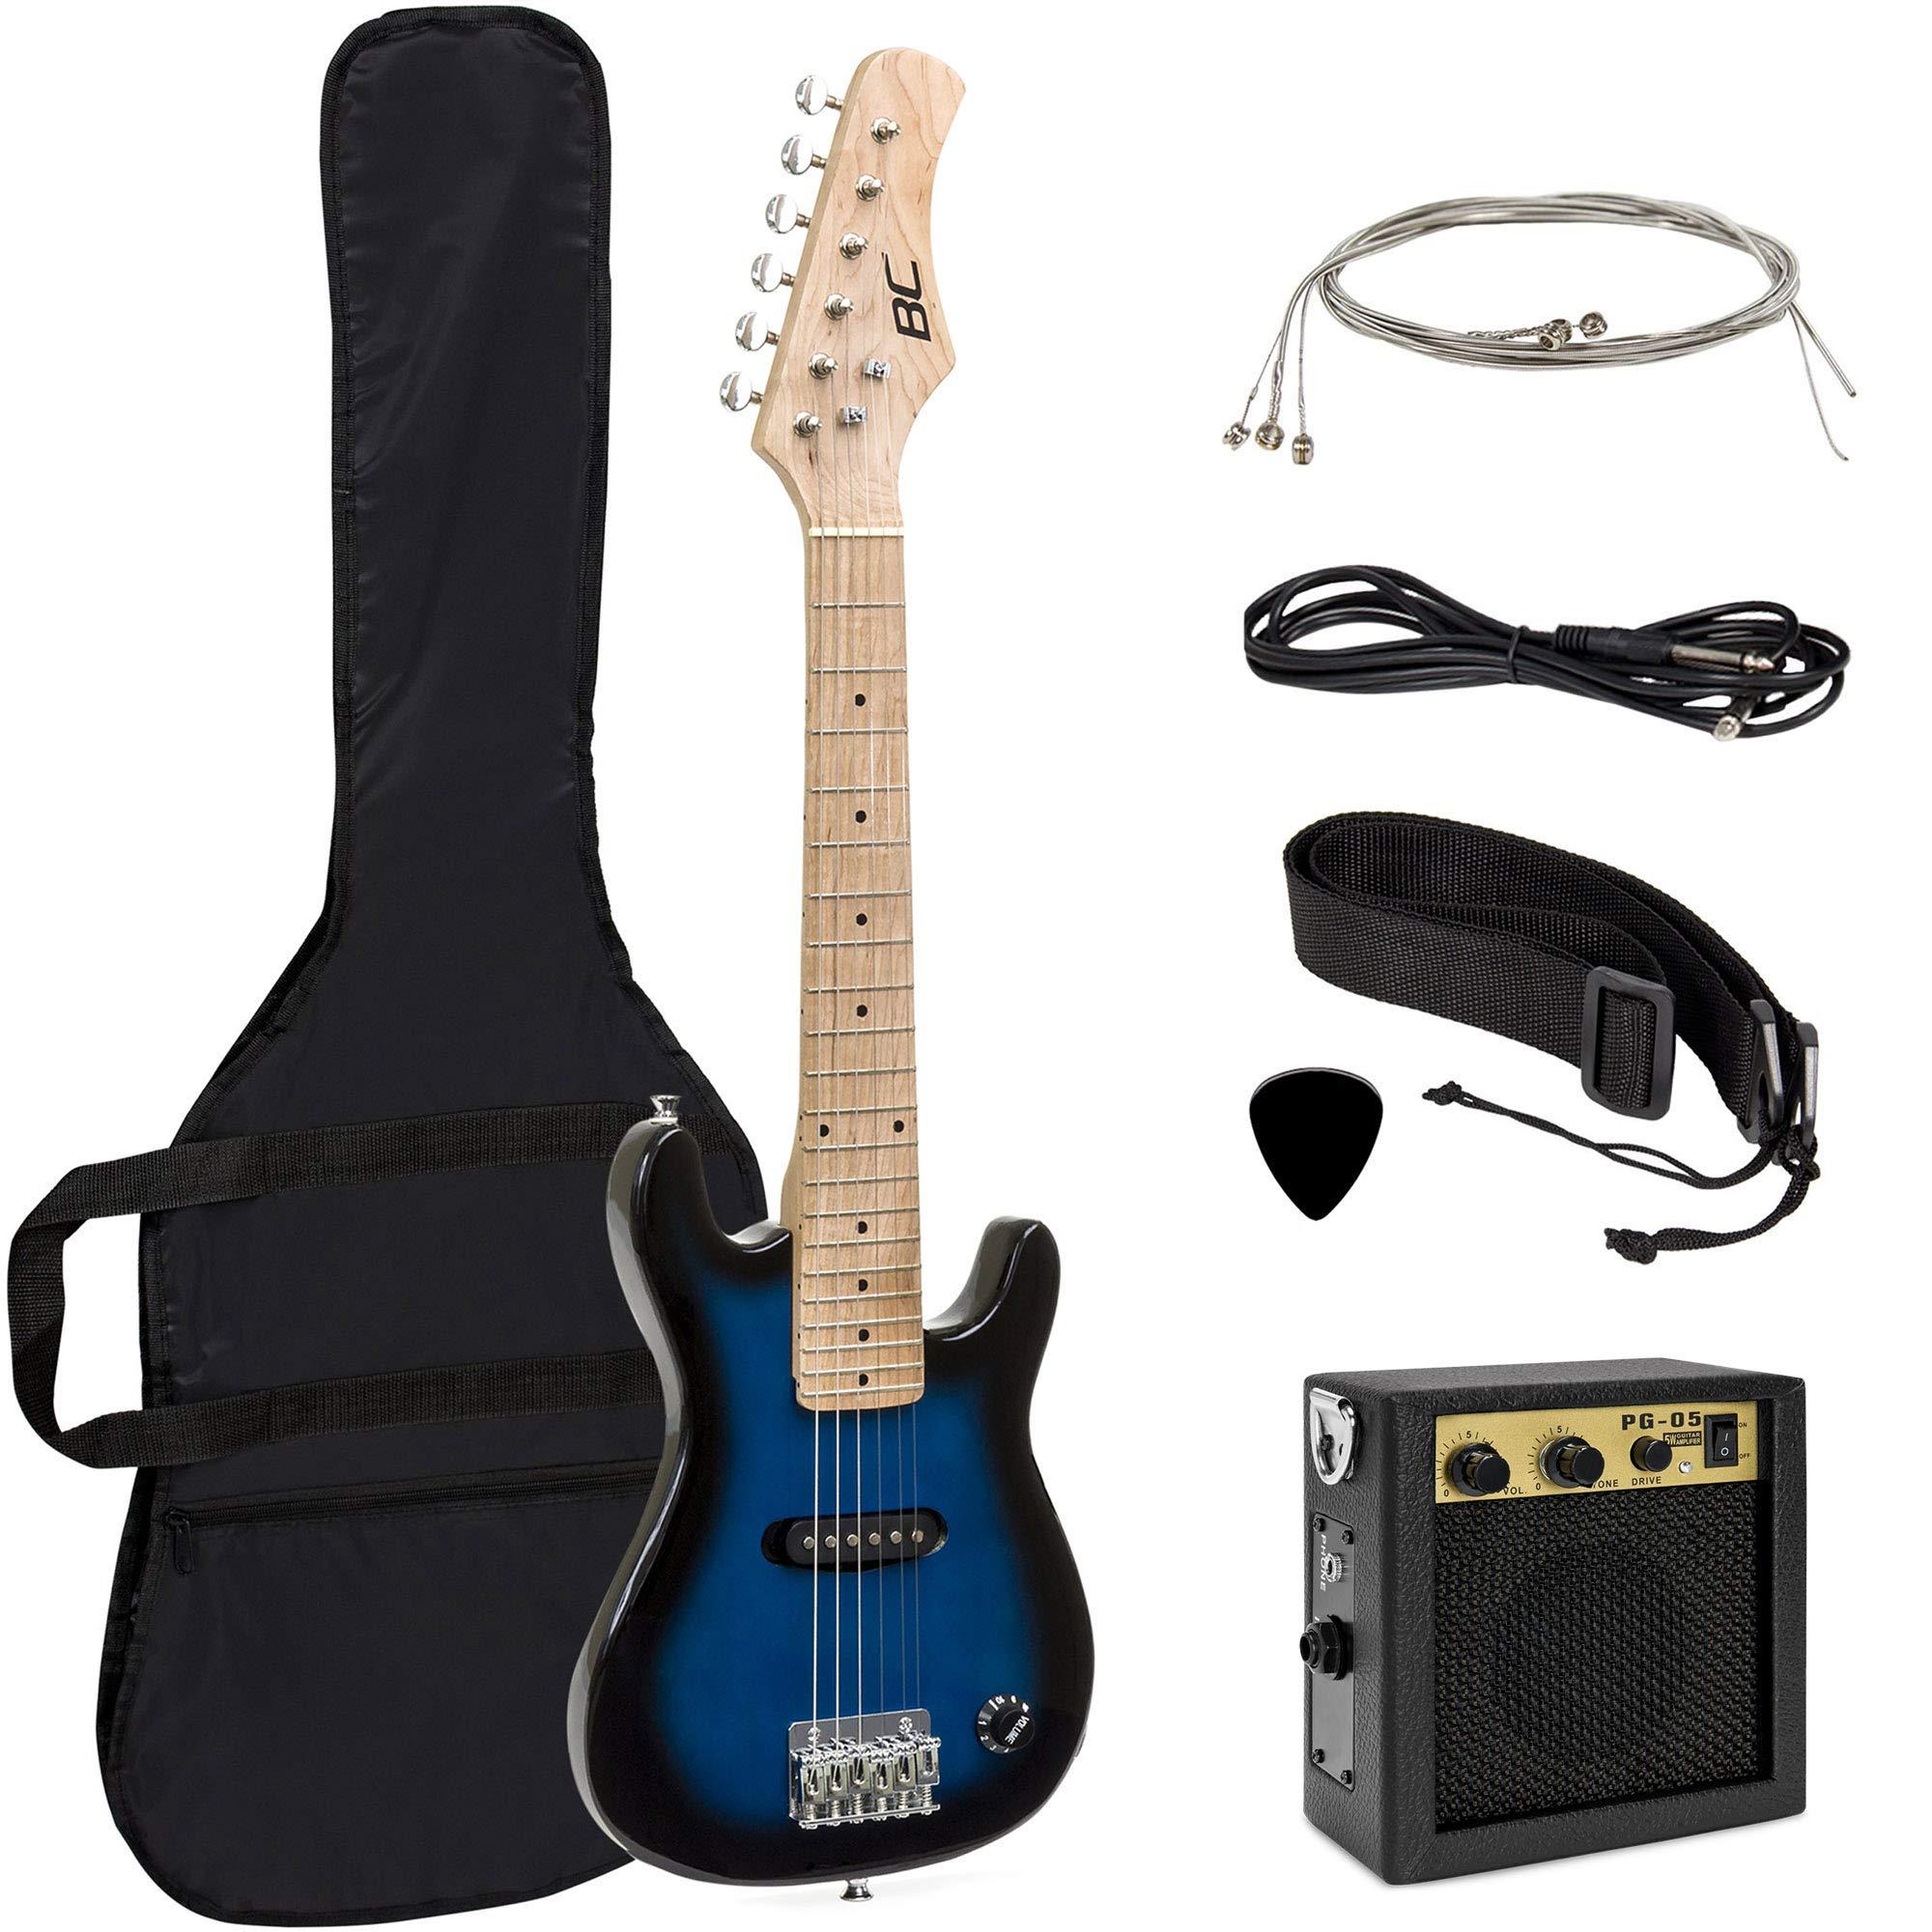 Best Choice Products Electric Guitar Kids 30'' Blue Guitar W/ Amp, Case, Strap (Blue)